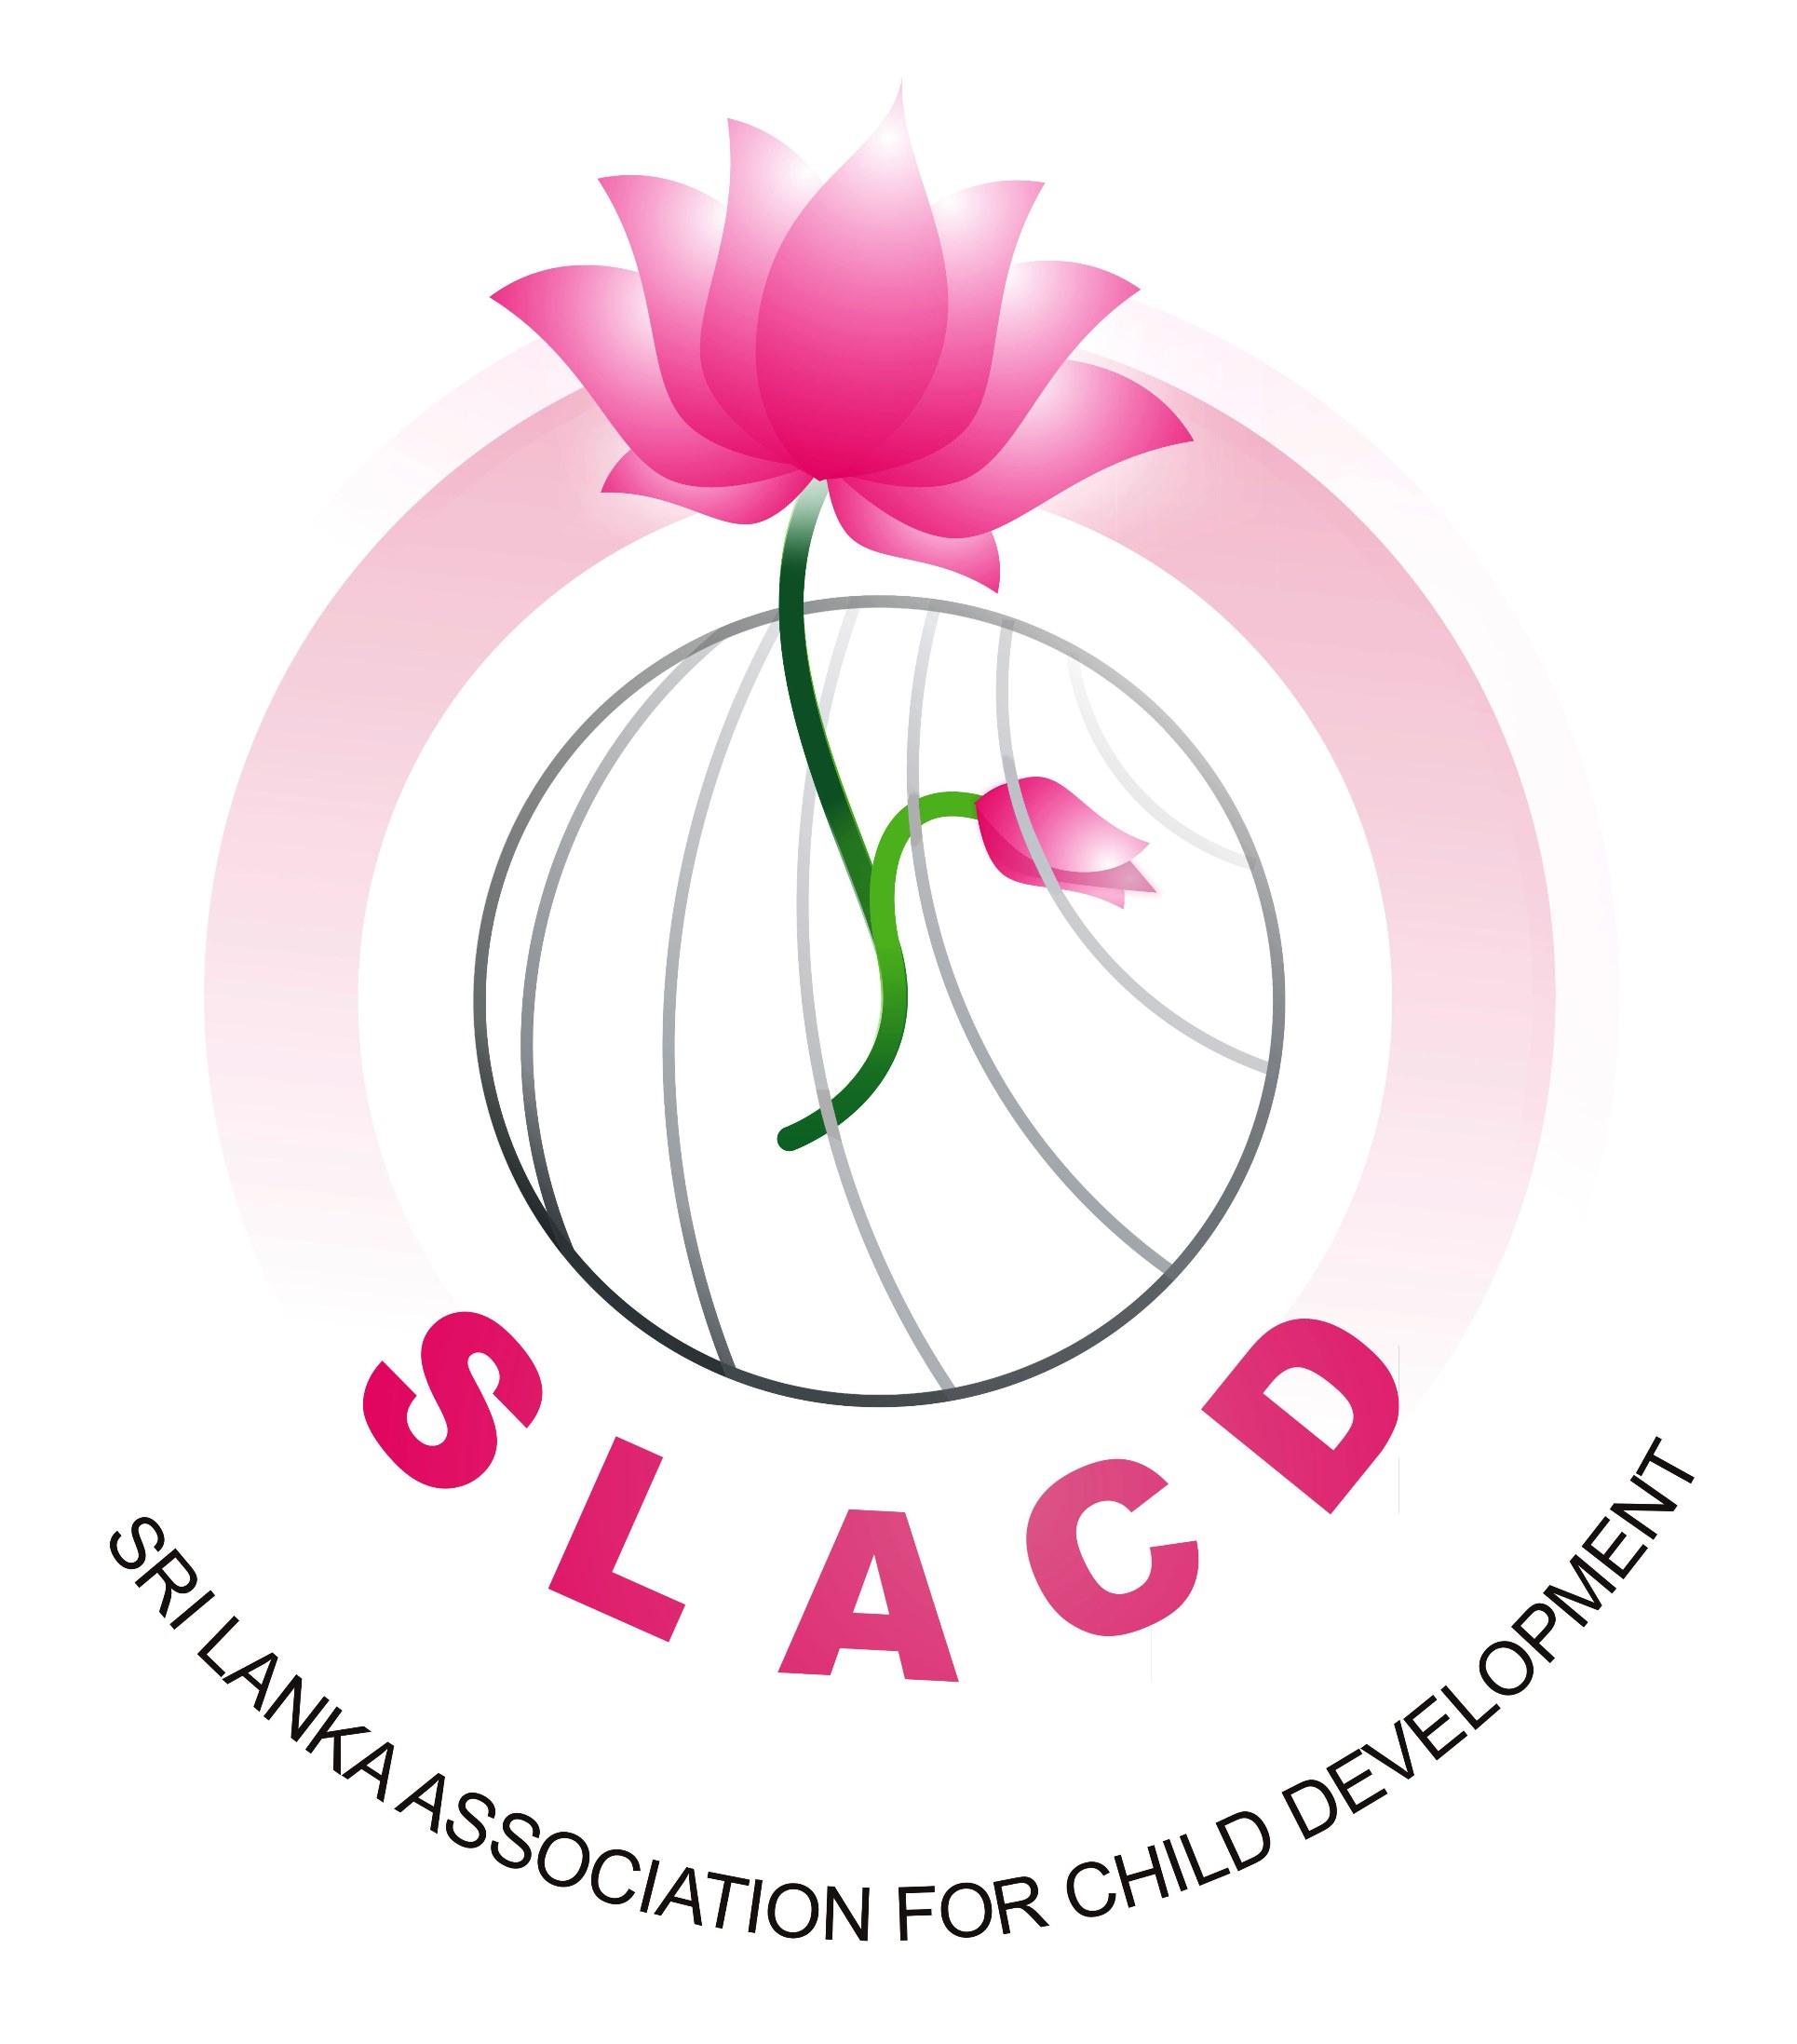 Sri Lanka Association for Child Development (SLACD)